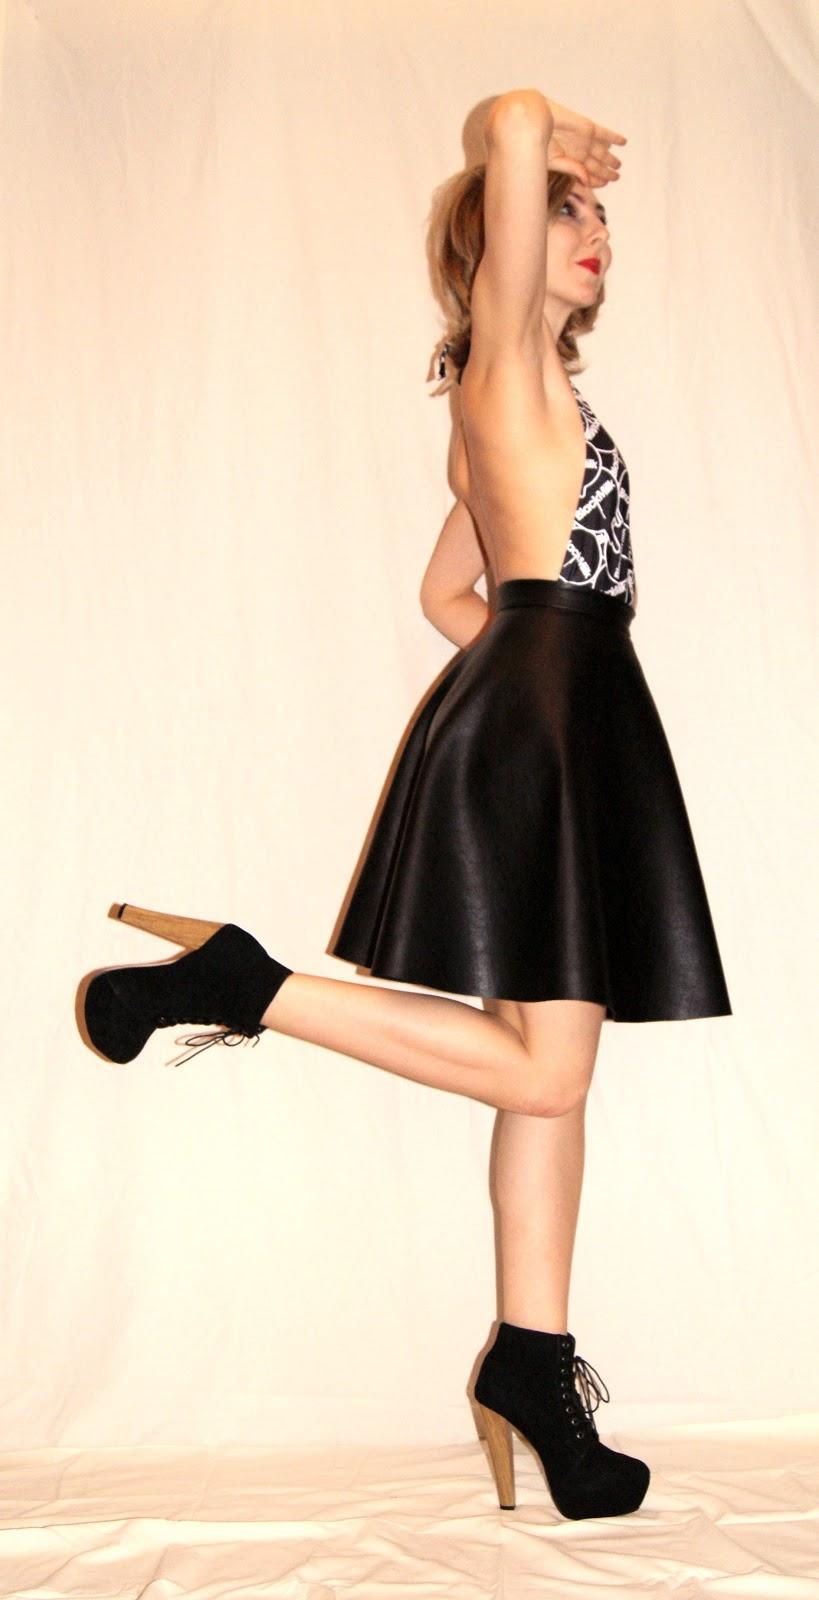 Semi circle skirt, PVC, vegan, Tocha's World, Black Milk